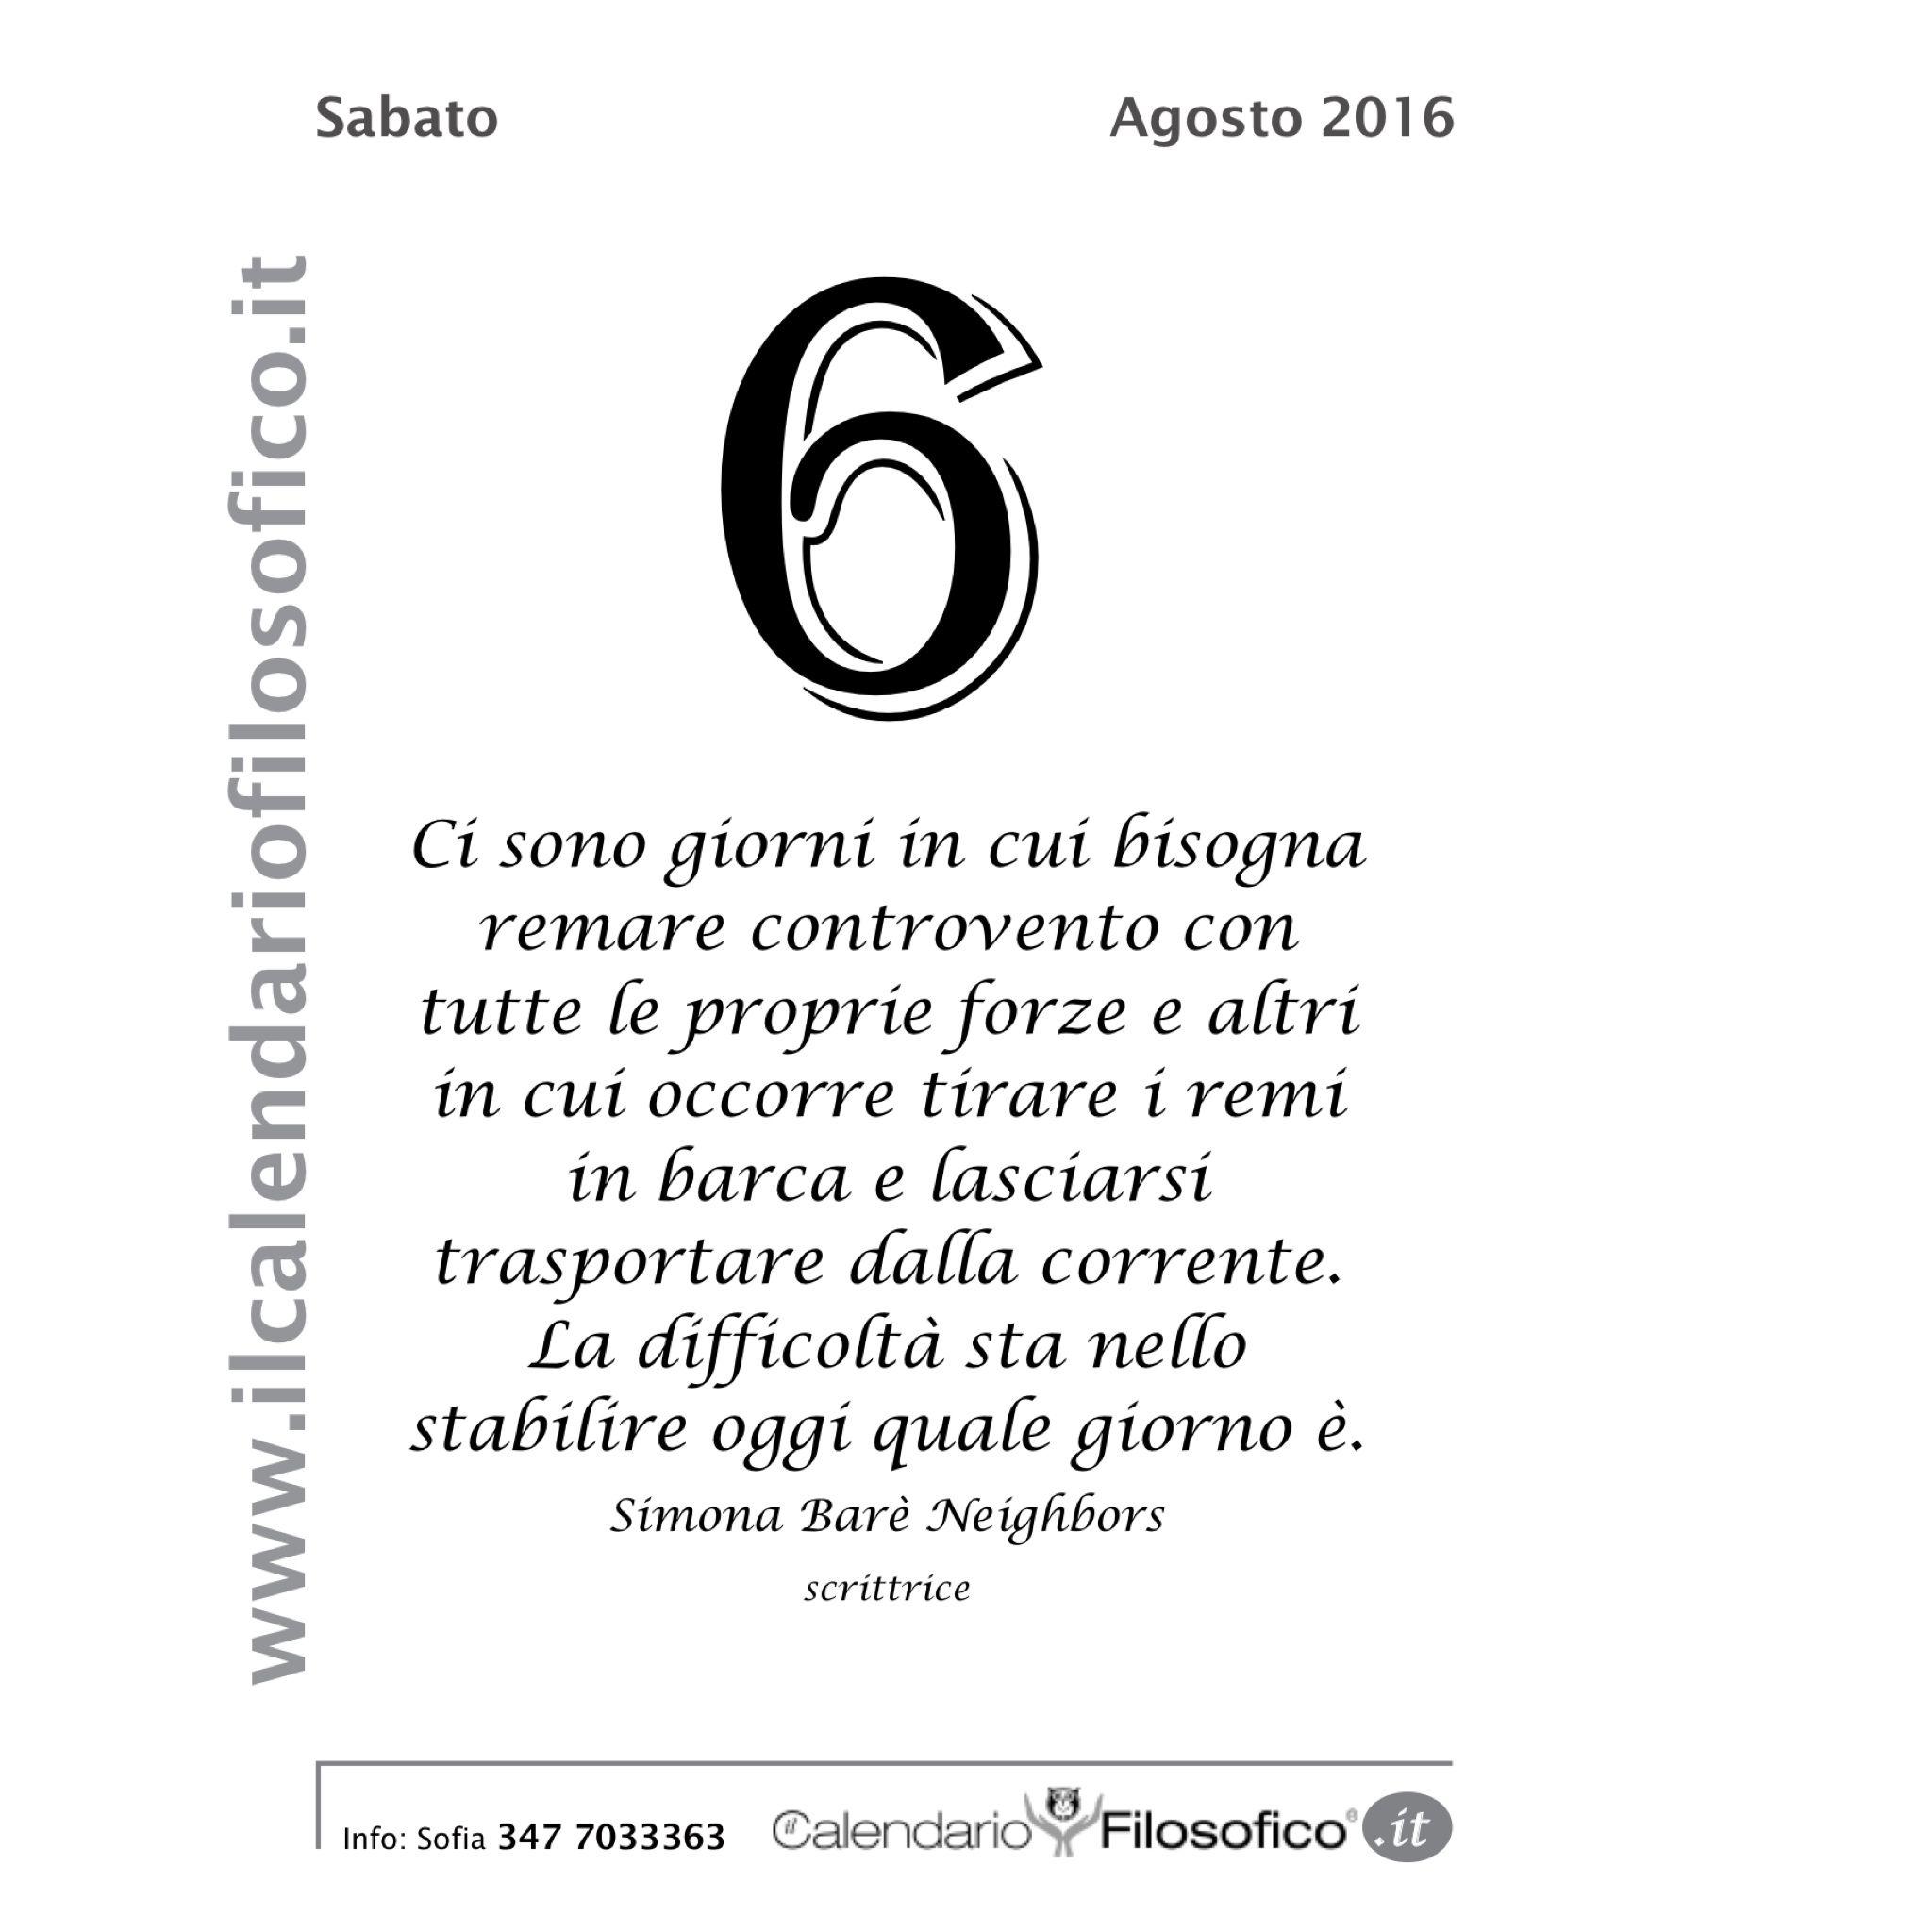 Popolare Il Calendario filosofico (Calendariofilos) on Pinterest GV83